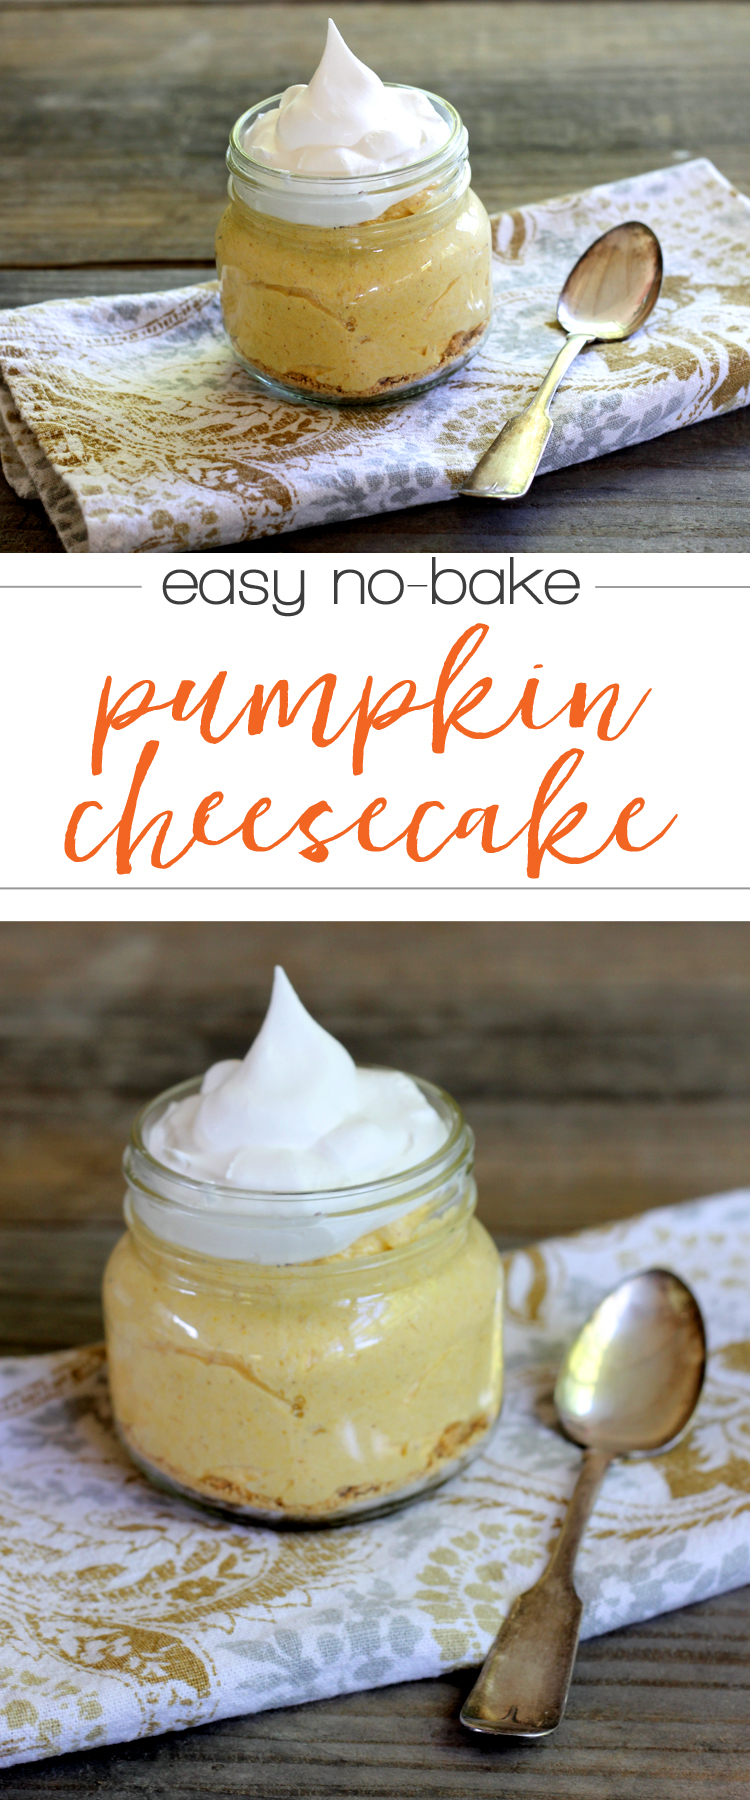 easy no bake pumpkin cheesecake recipe